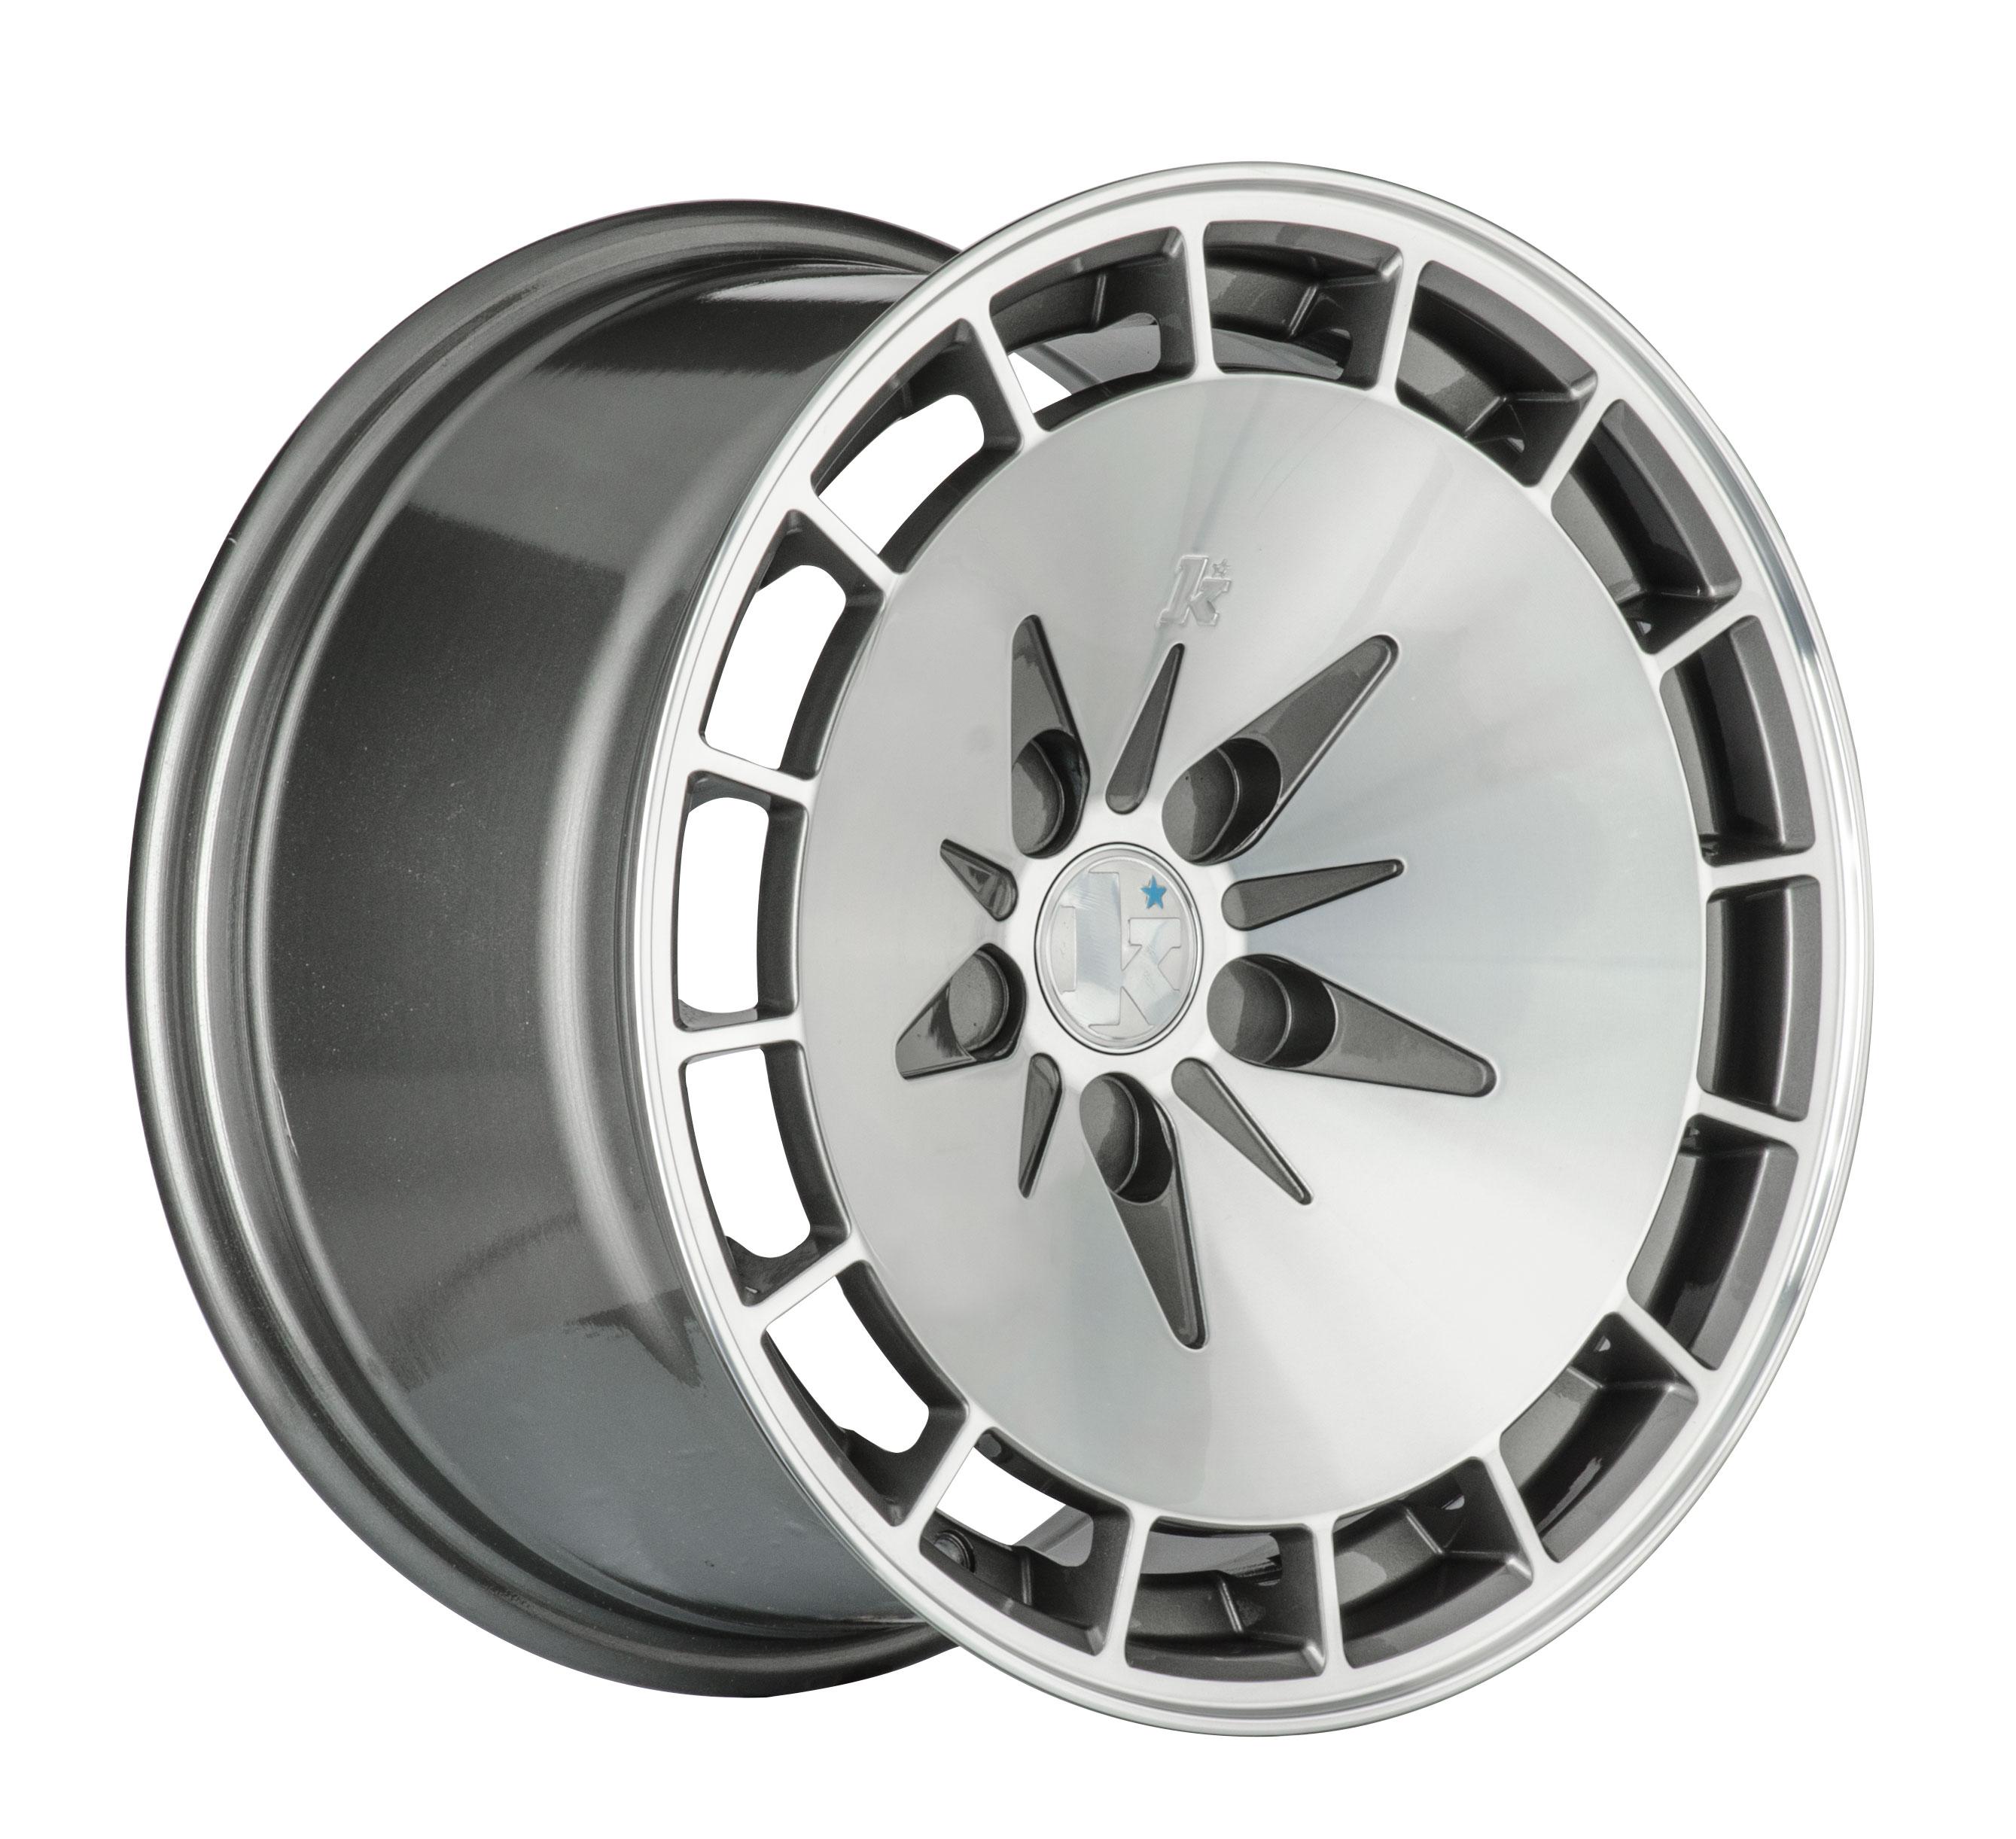 "16"" KLUTCH KM16 Wheels - Gunmetal Polished - VW / Audi - 4x100"